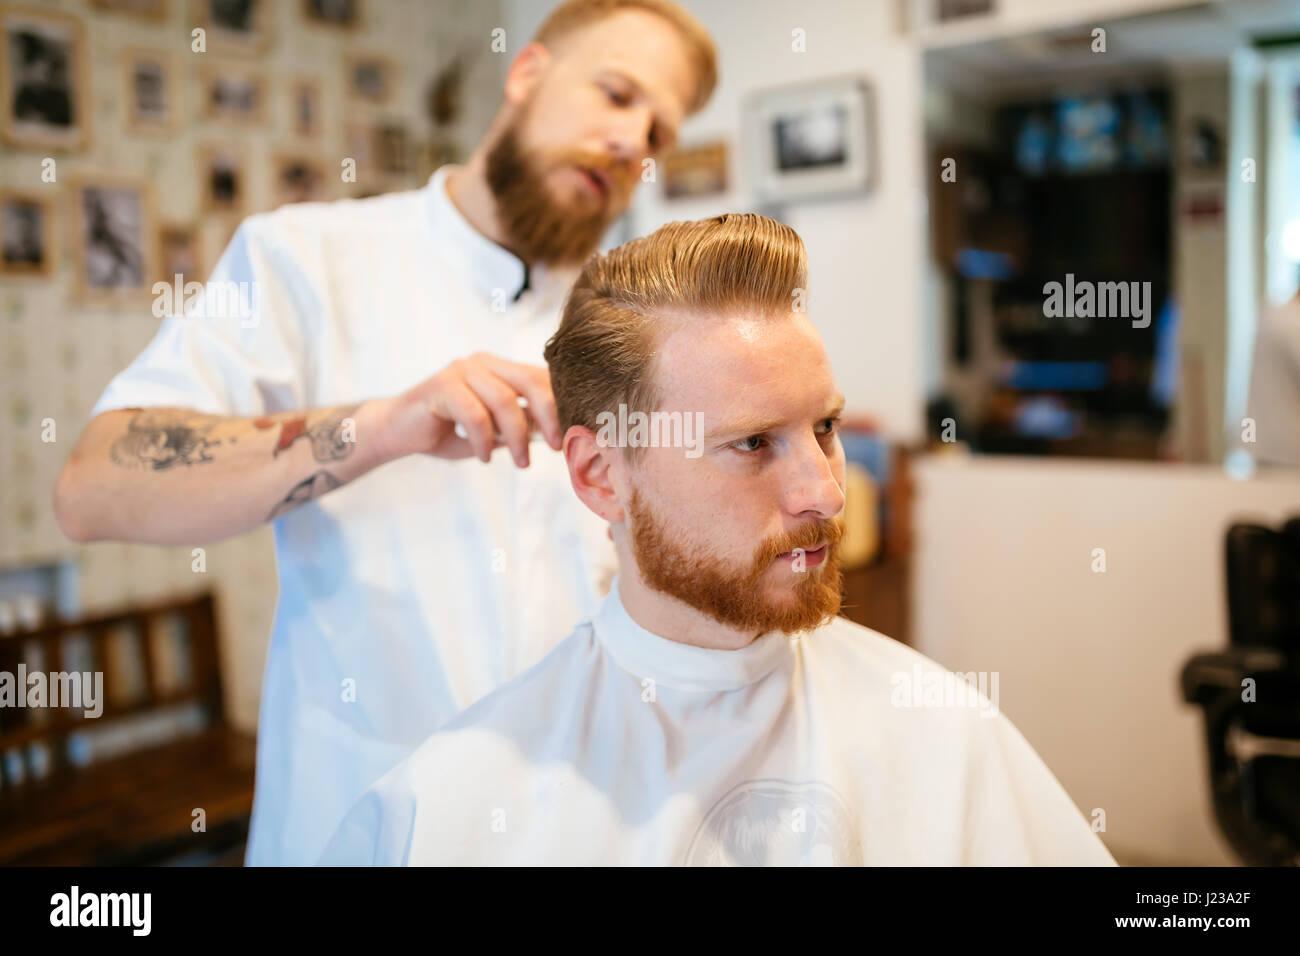 Recibir tratamiento barba cabello masculino en Barber shop Imagen De Stock